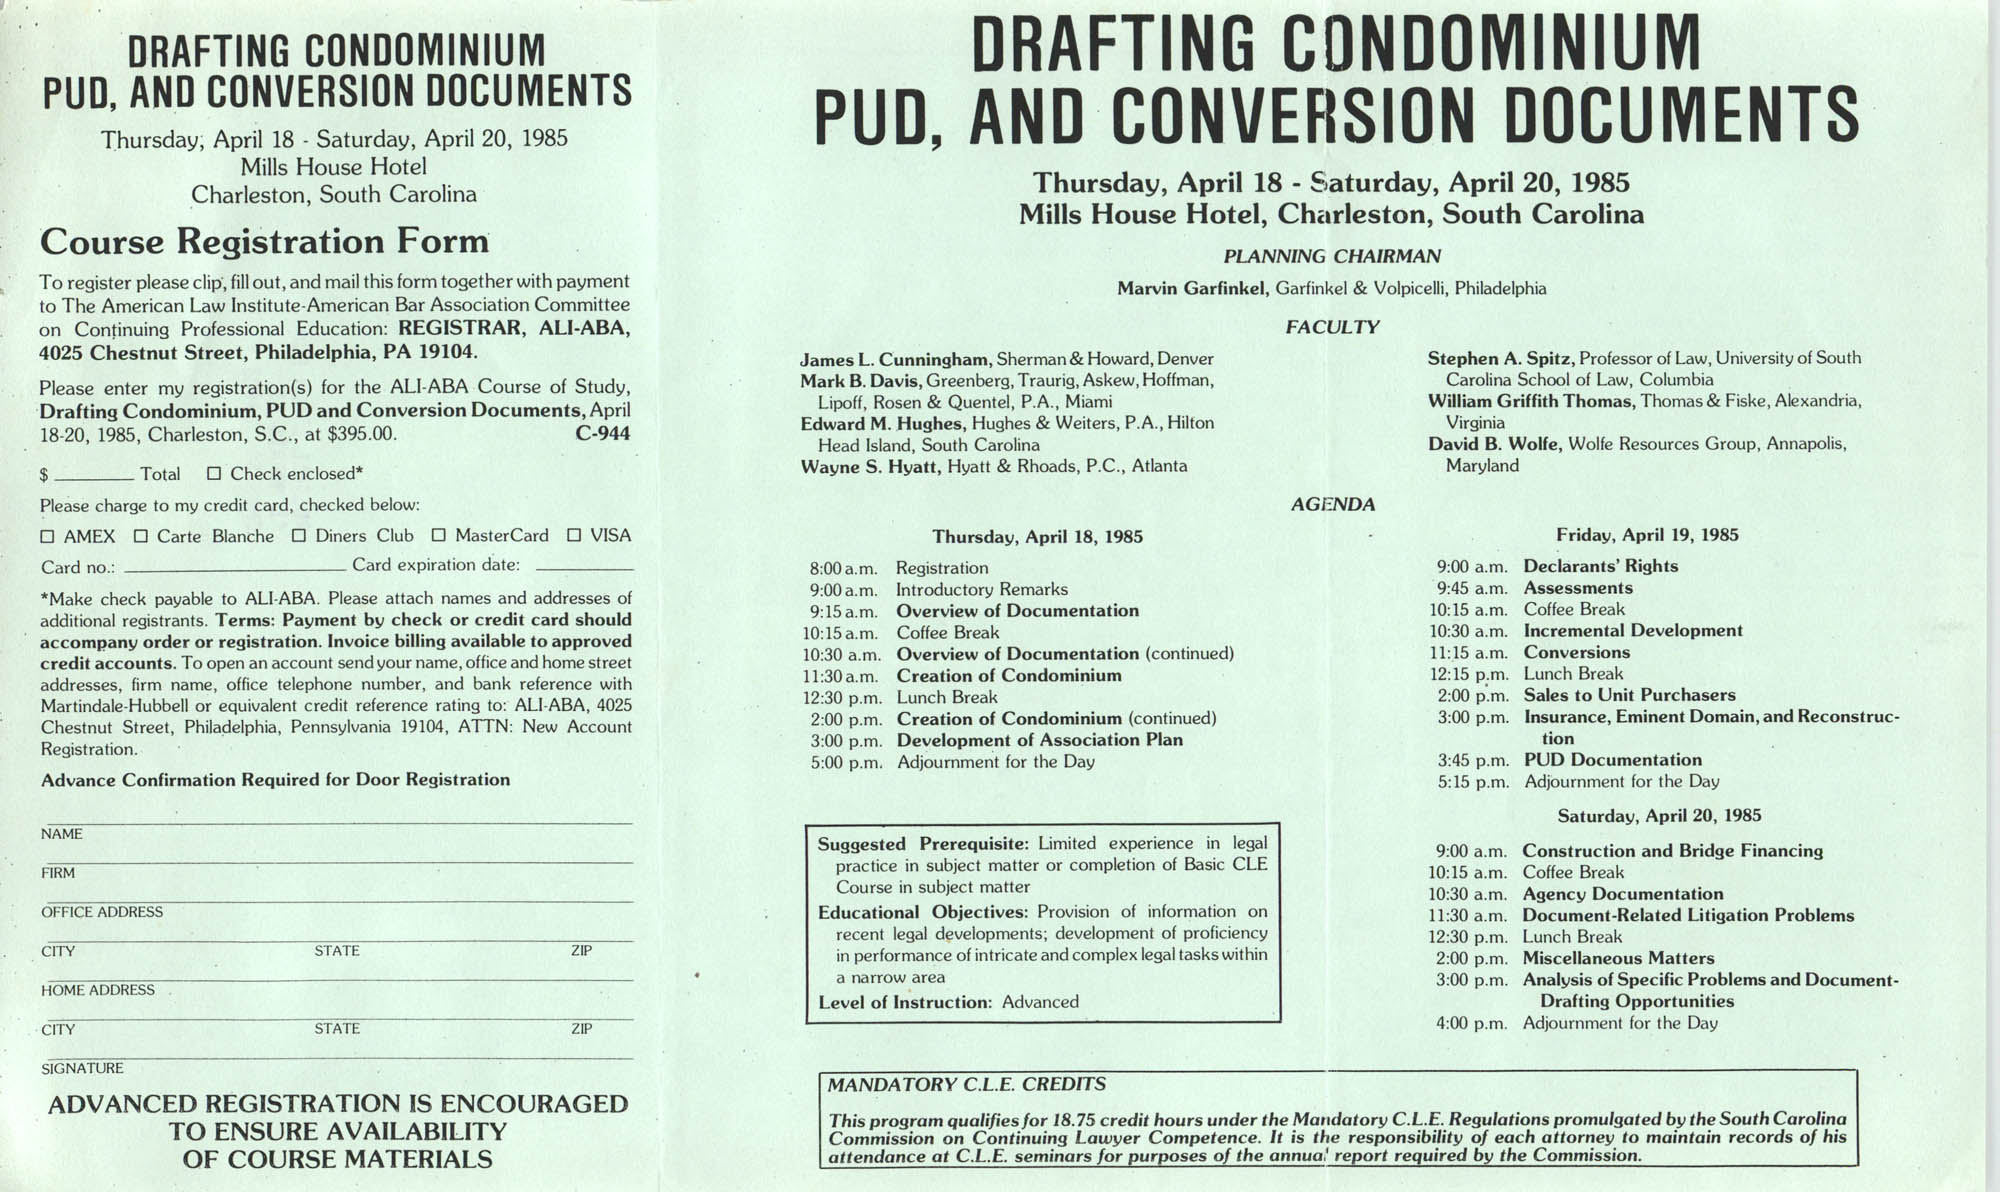 Drafting Condominium PUD, and Conversion Documents, Continuing Legal Education Seminar Pamphlet, April 18-20, 1985